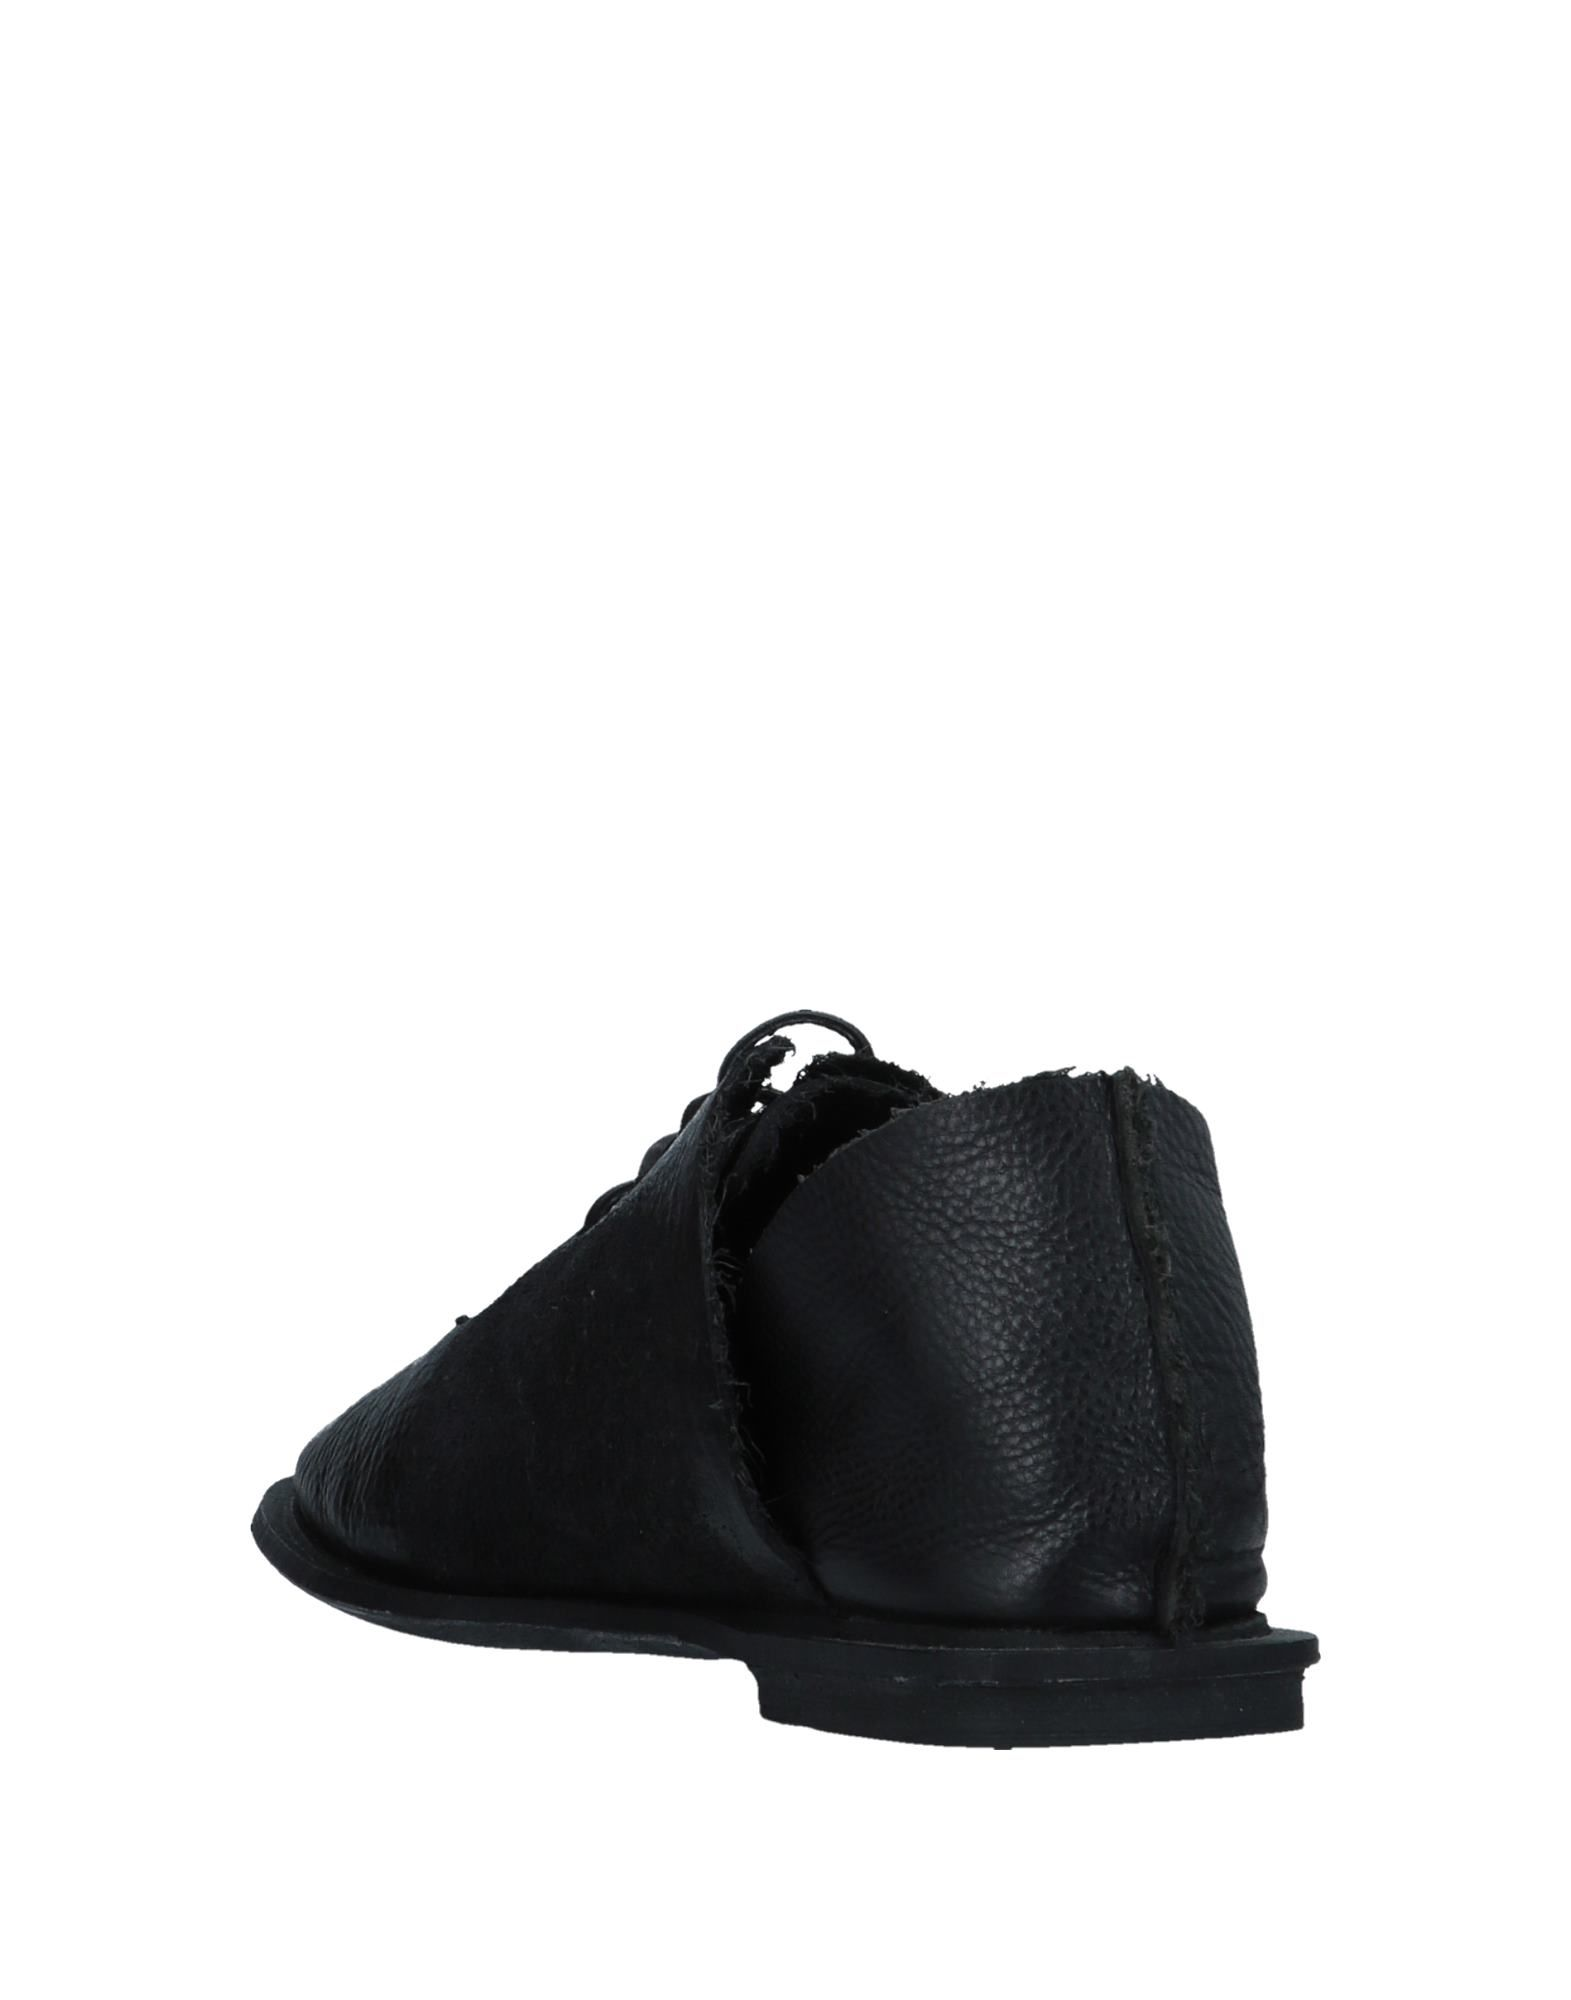 Petrucha Schnürschuhe Herren  beliebte 11538454IR Gute Qualität beliebte  Schuhe 64025f